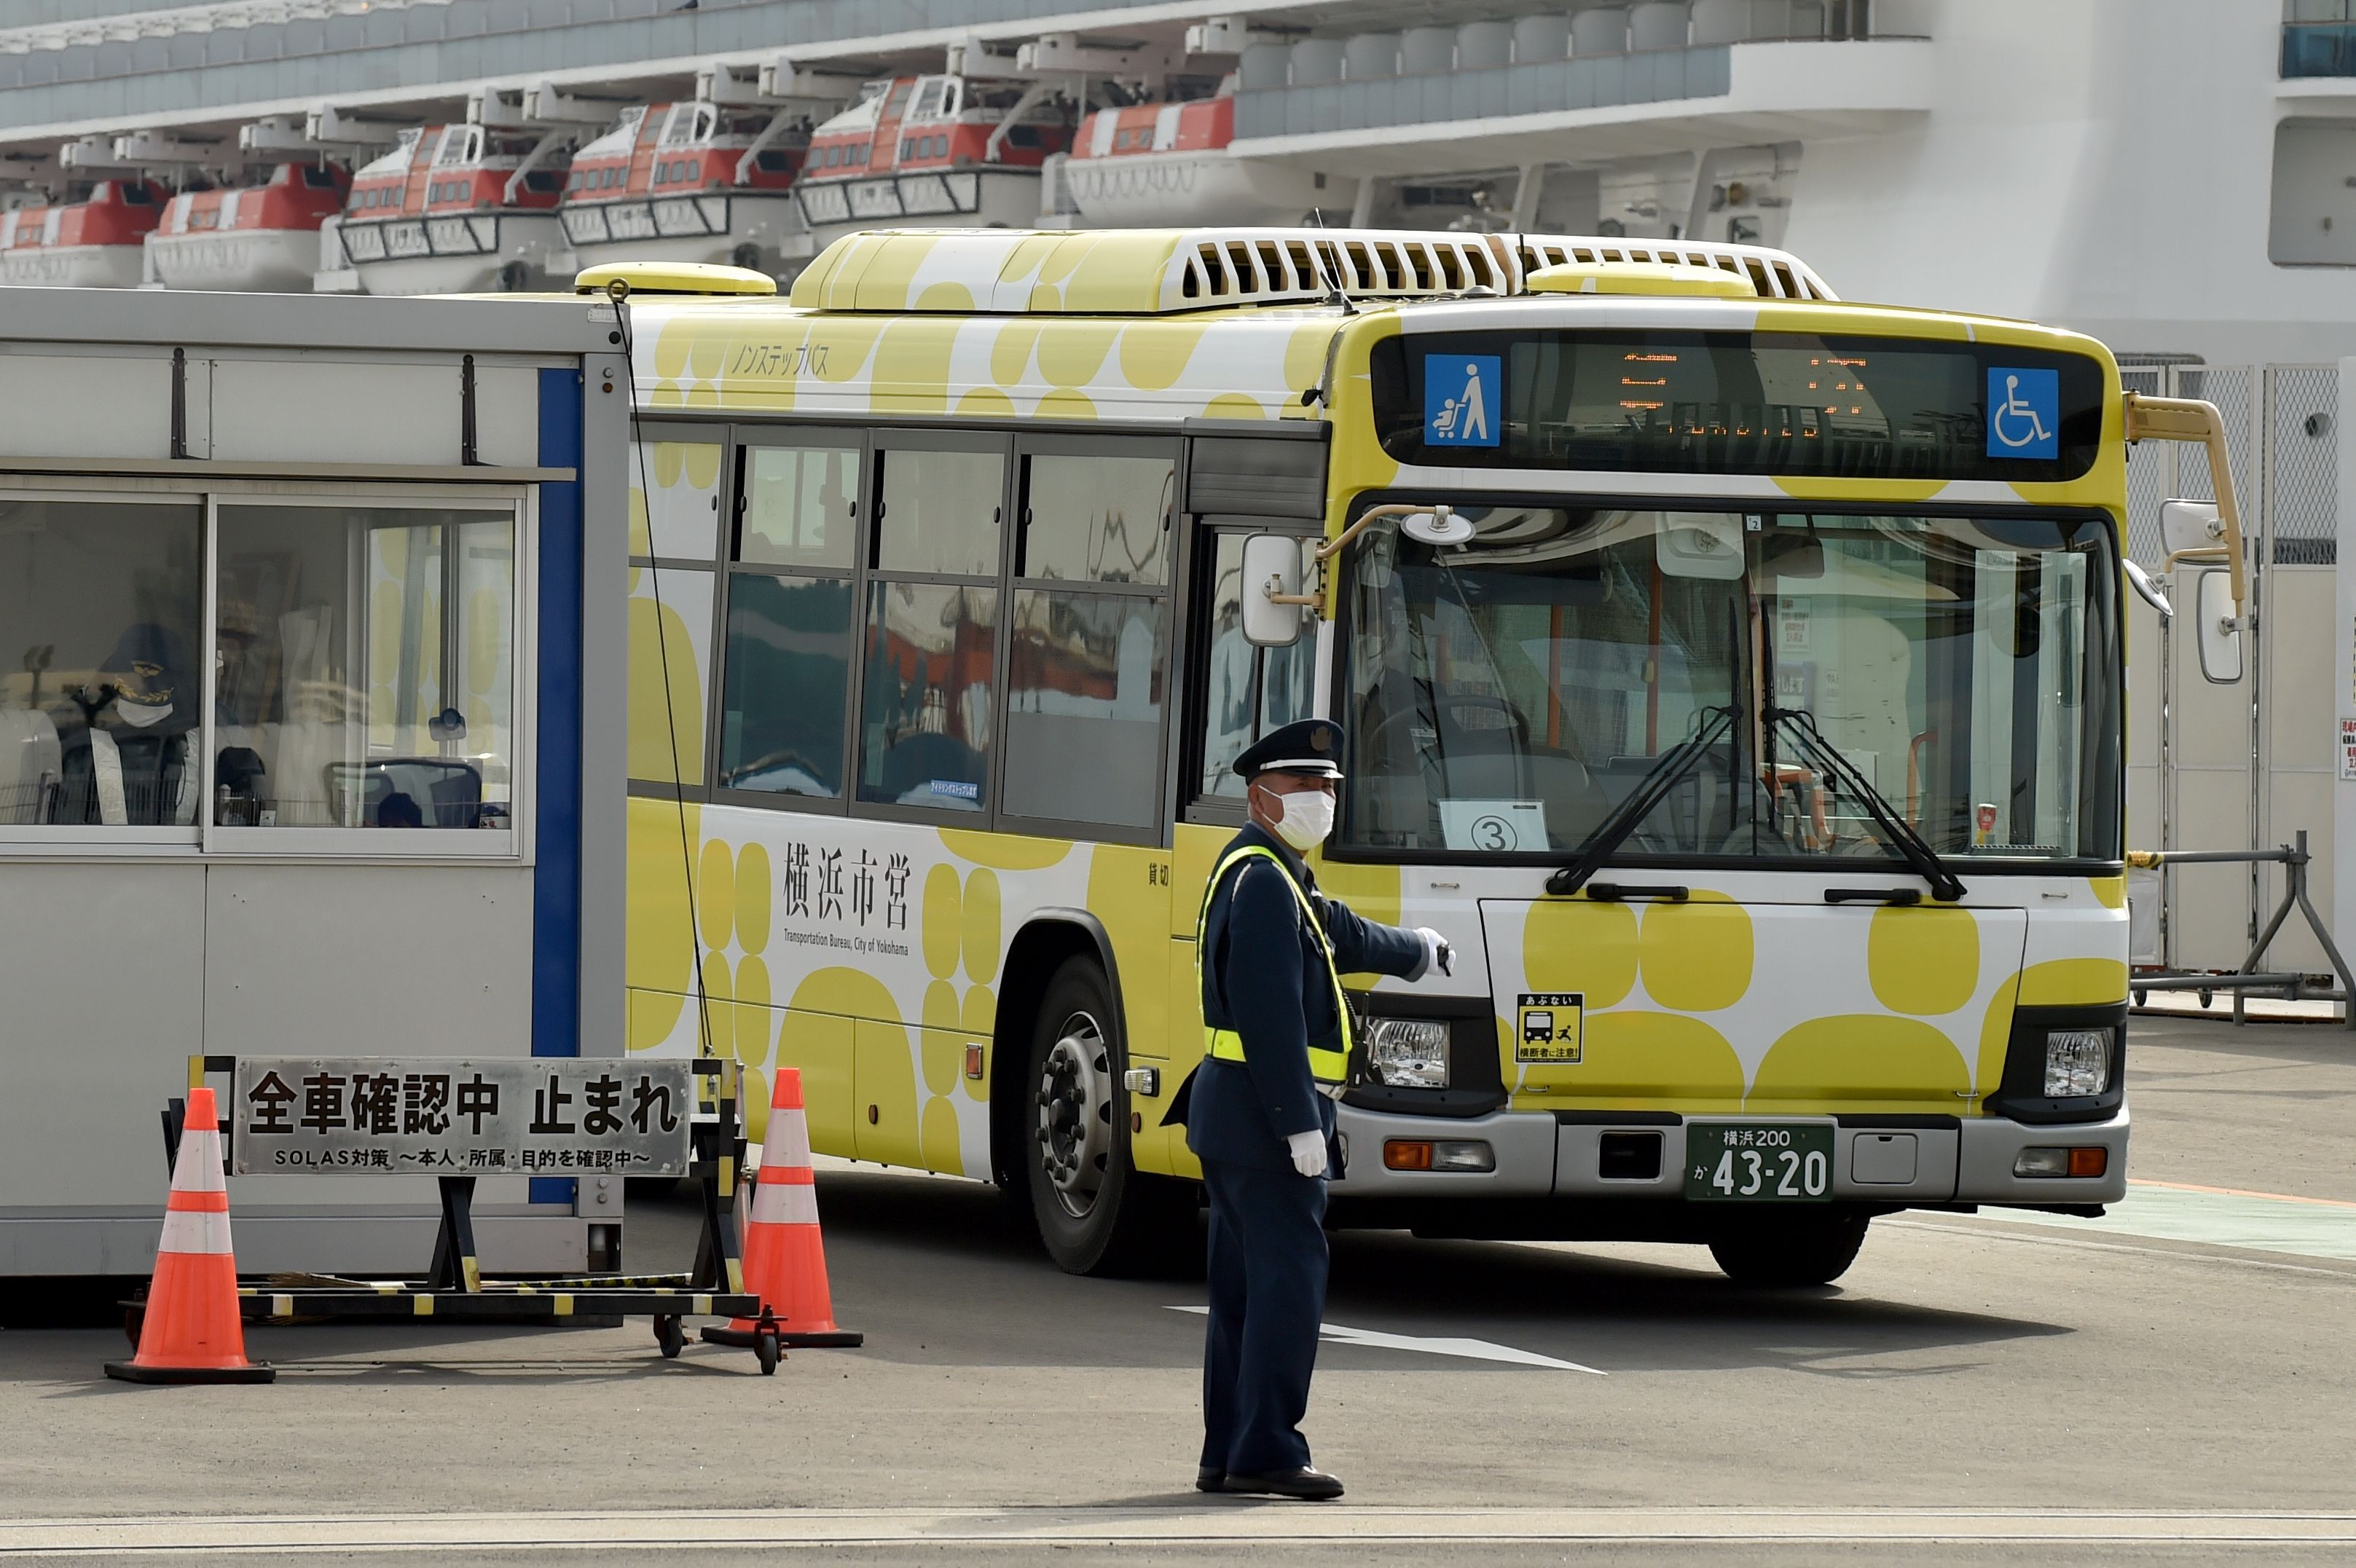 Coronavirus kills 2 Diamond Princess cruise ship passengers - Axios